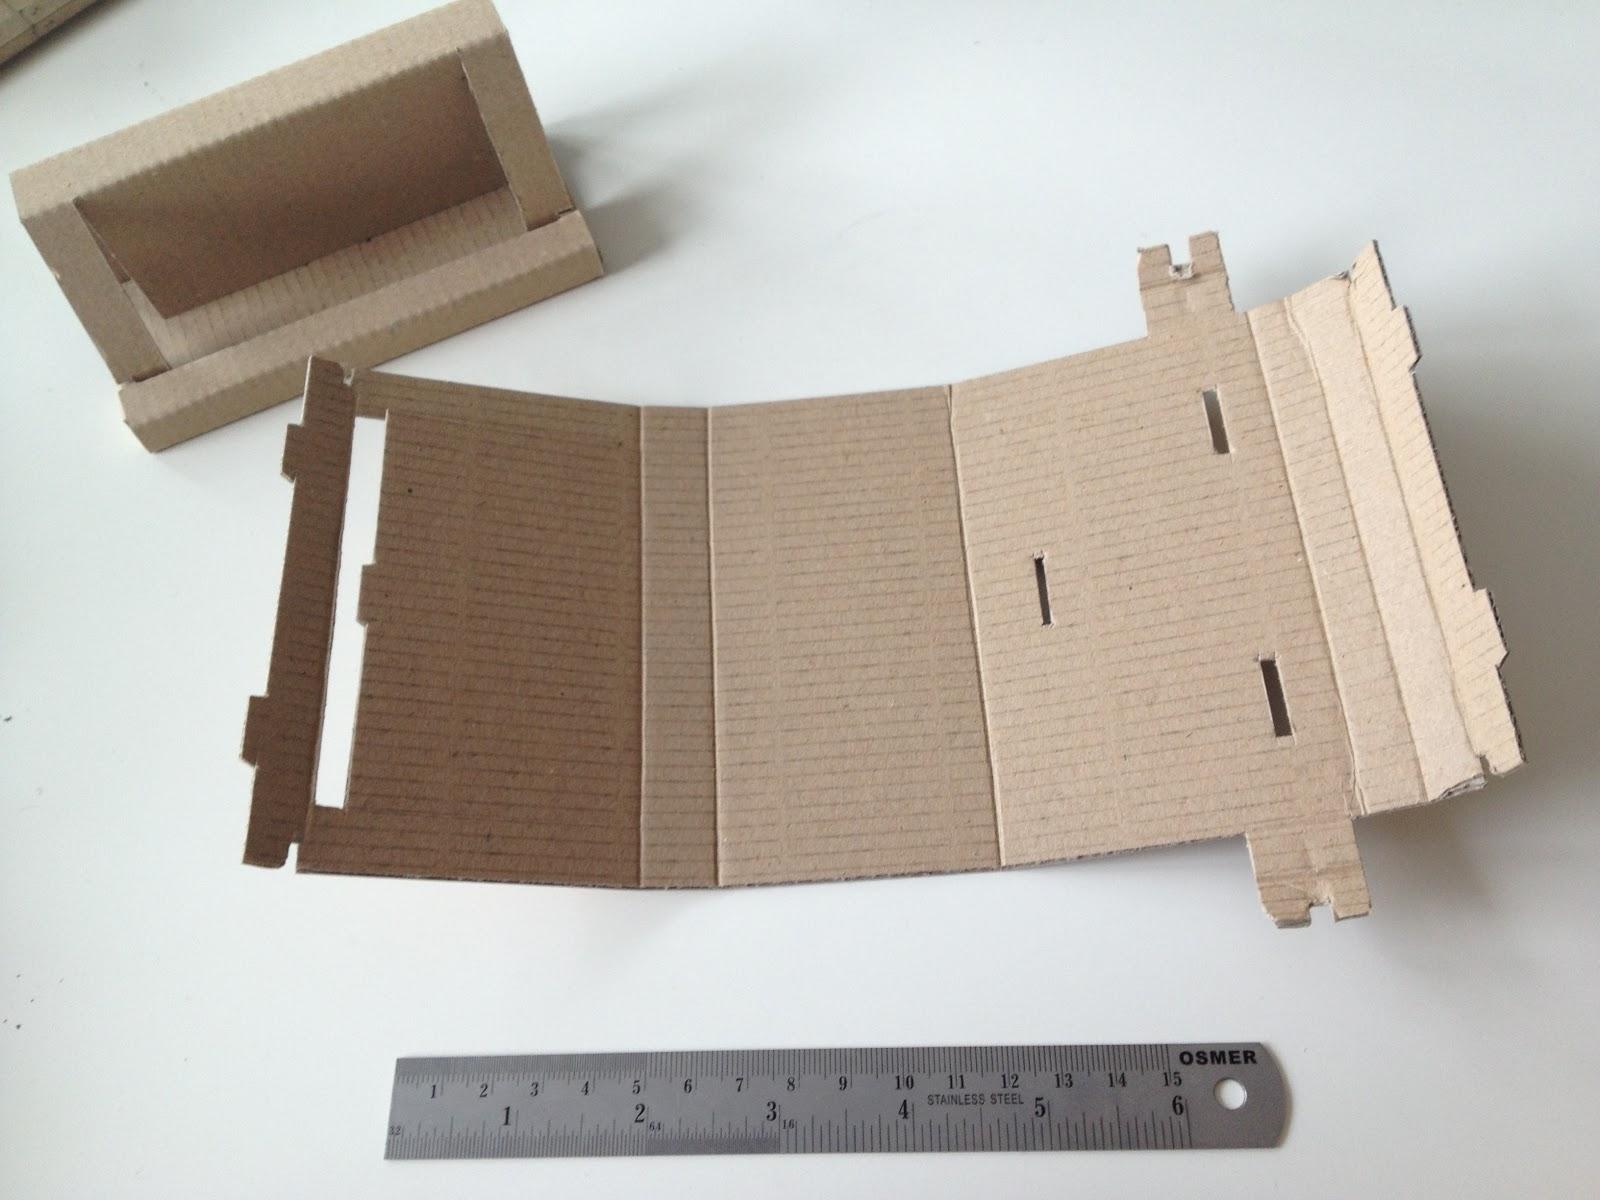 Runaway Prototype Design: Cardboard business card holder reloaded